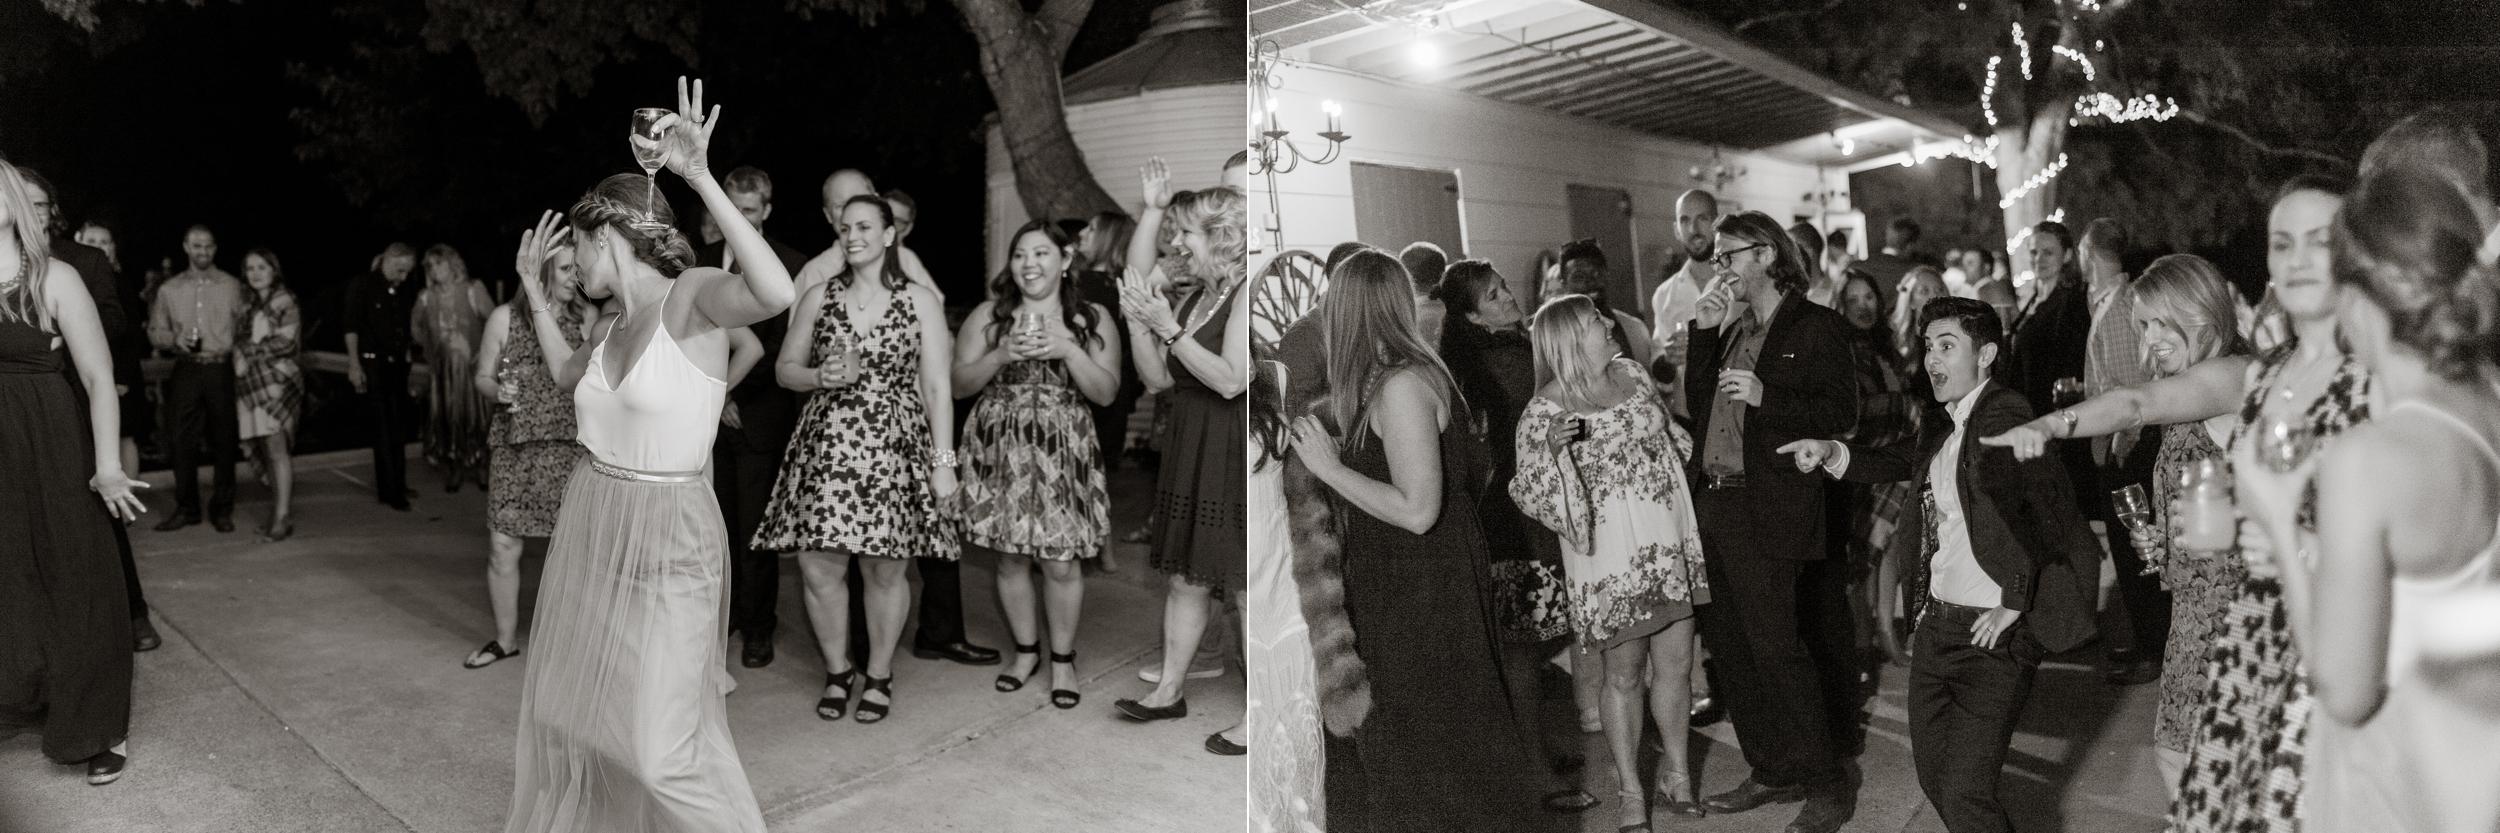 california-ranch-wedding-photographer-vc100_WEB.jpg